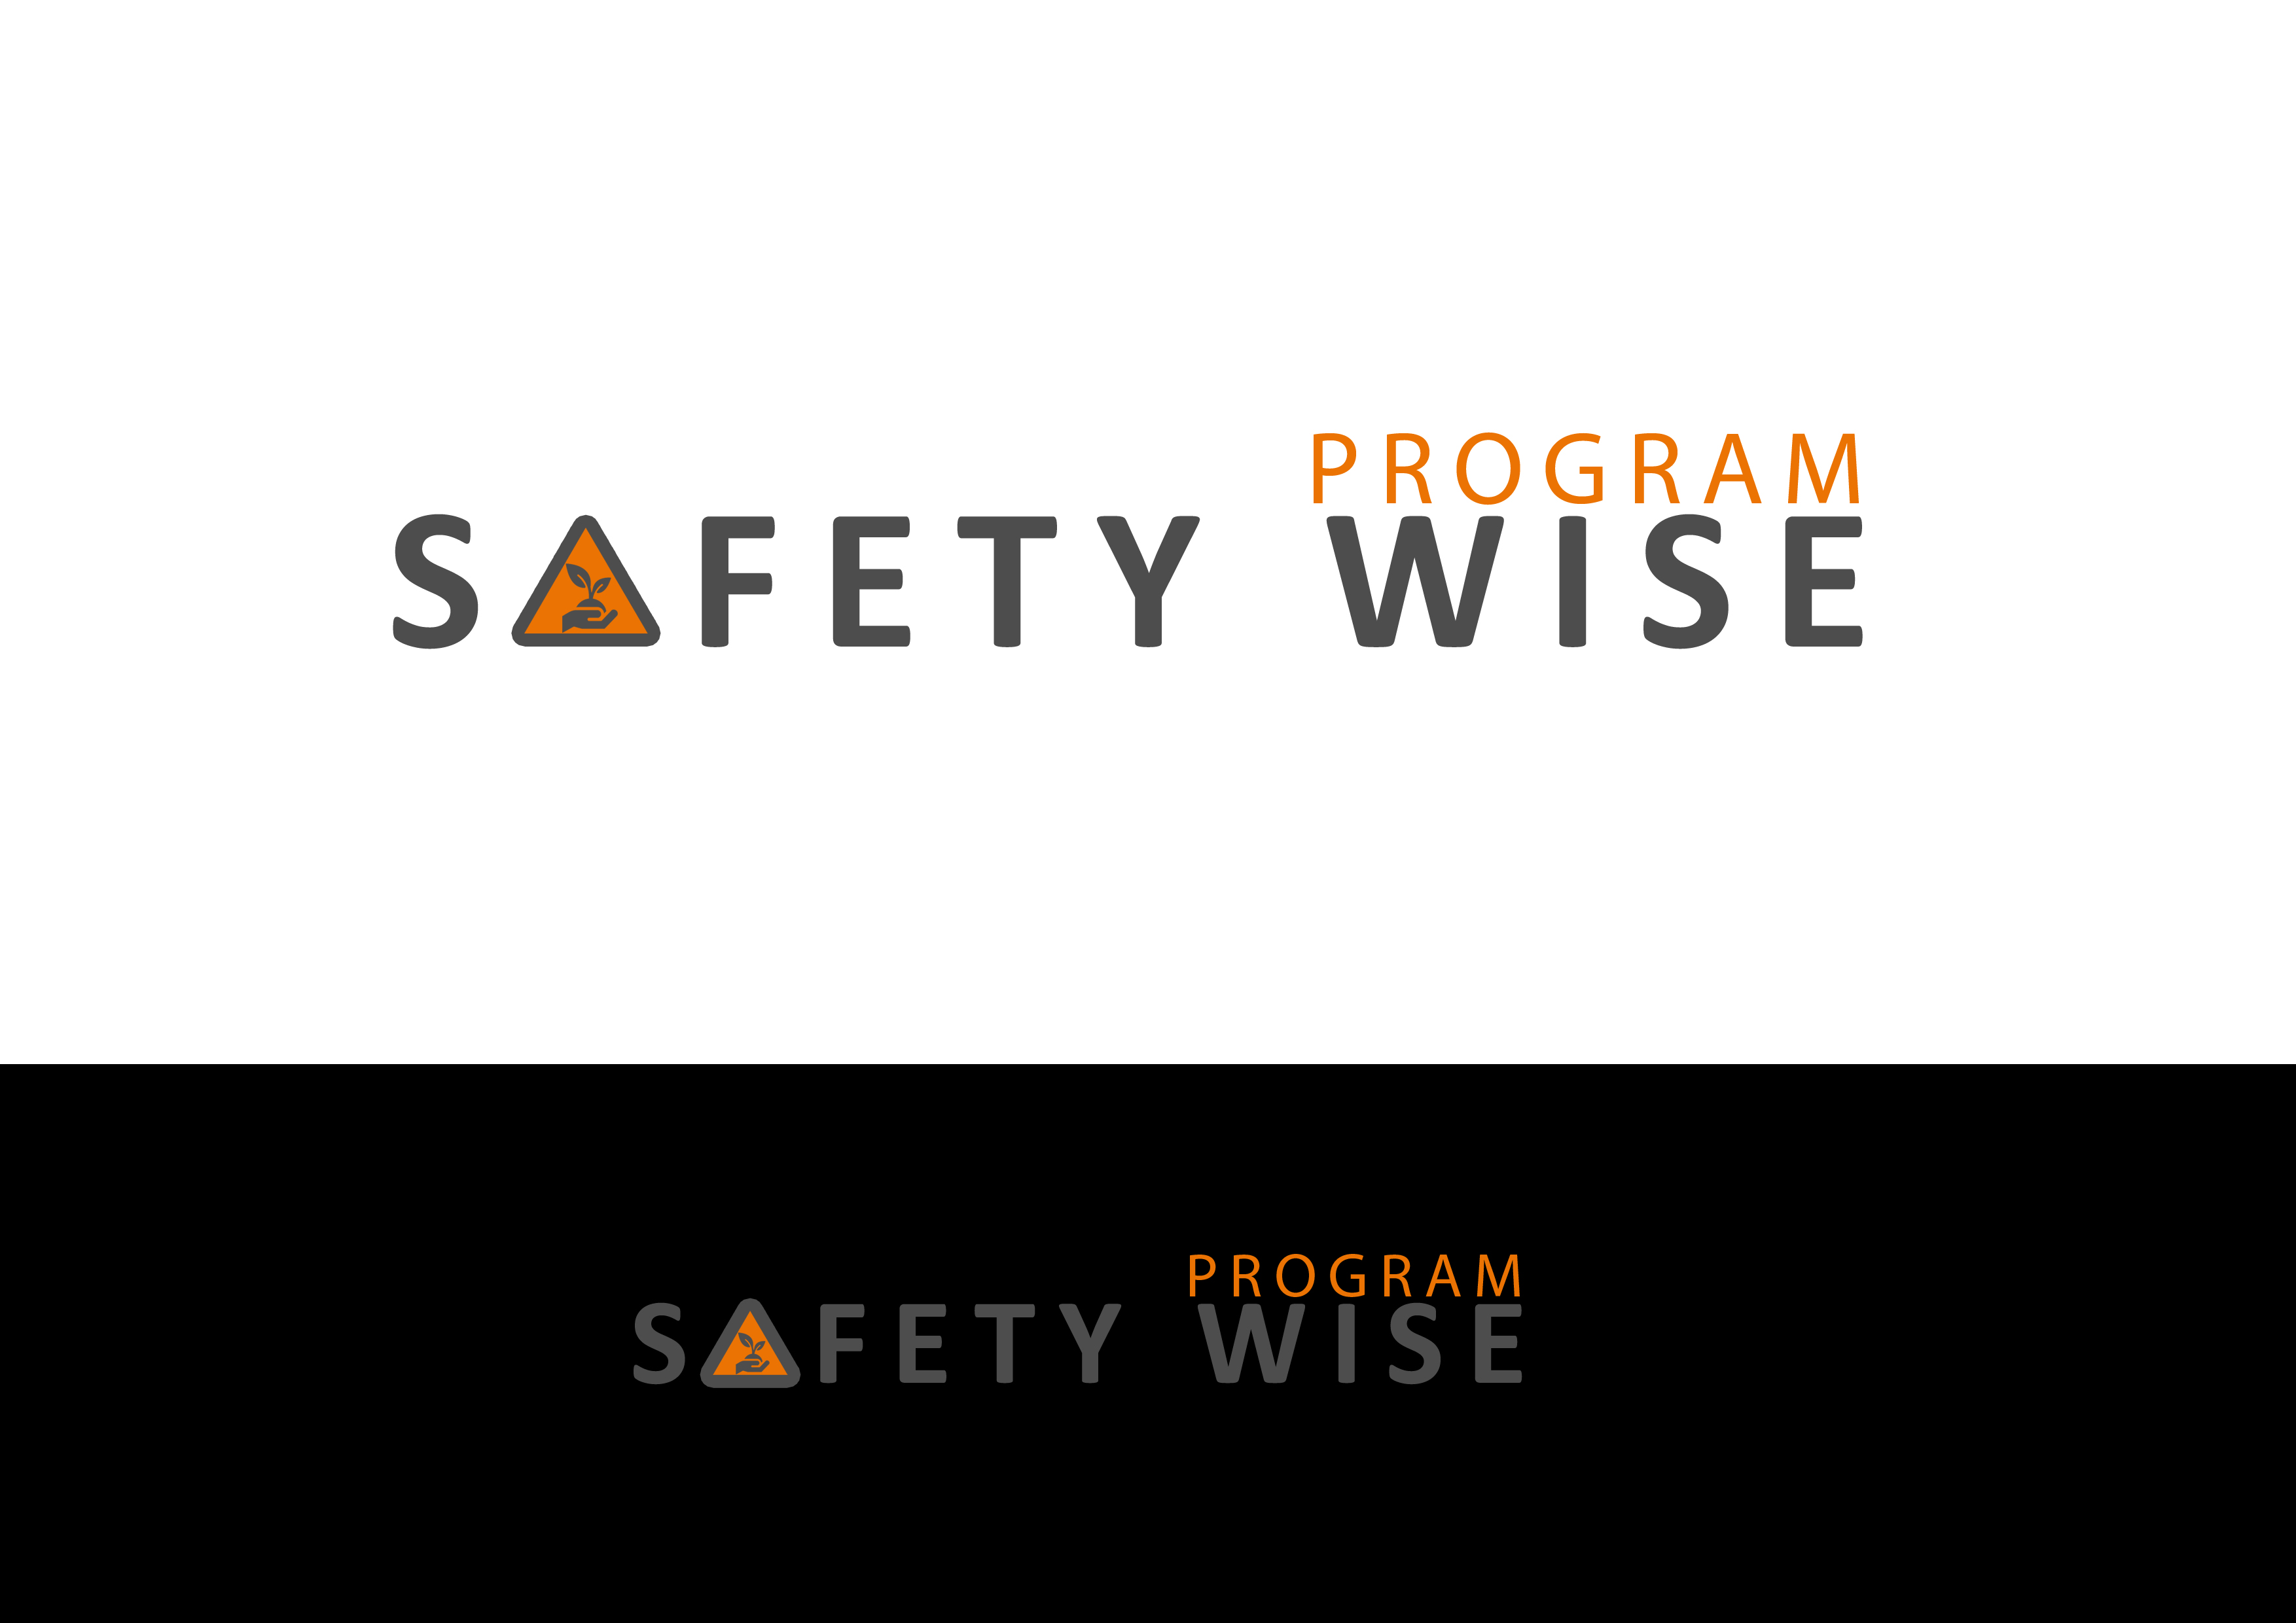 Logo Design by JSDESIGNGROUP - Entry No. 196 in the Logo Design Contest New Logo Design for Safety Wise Program.